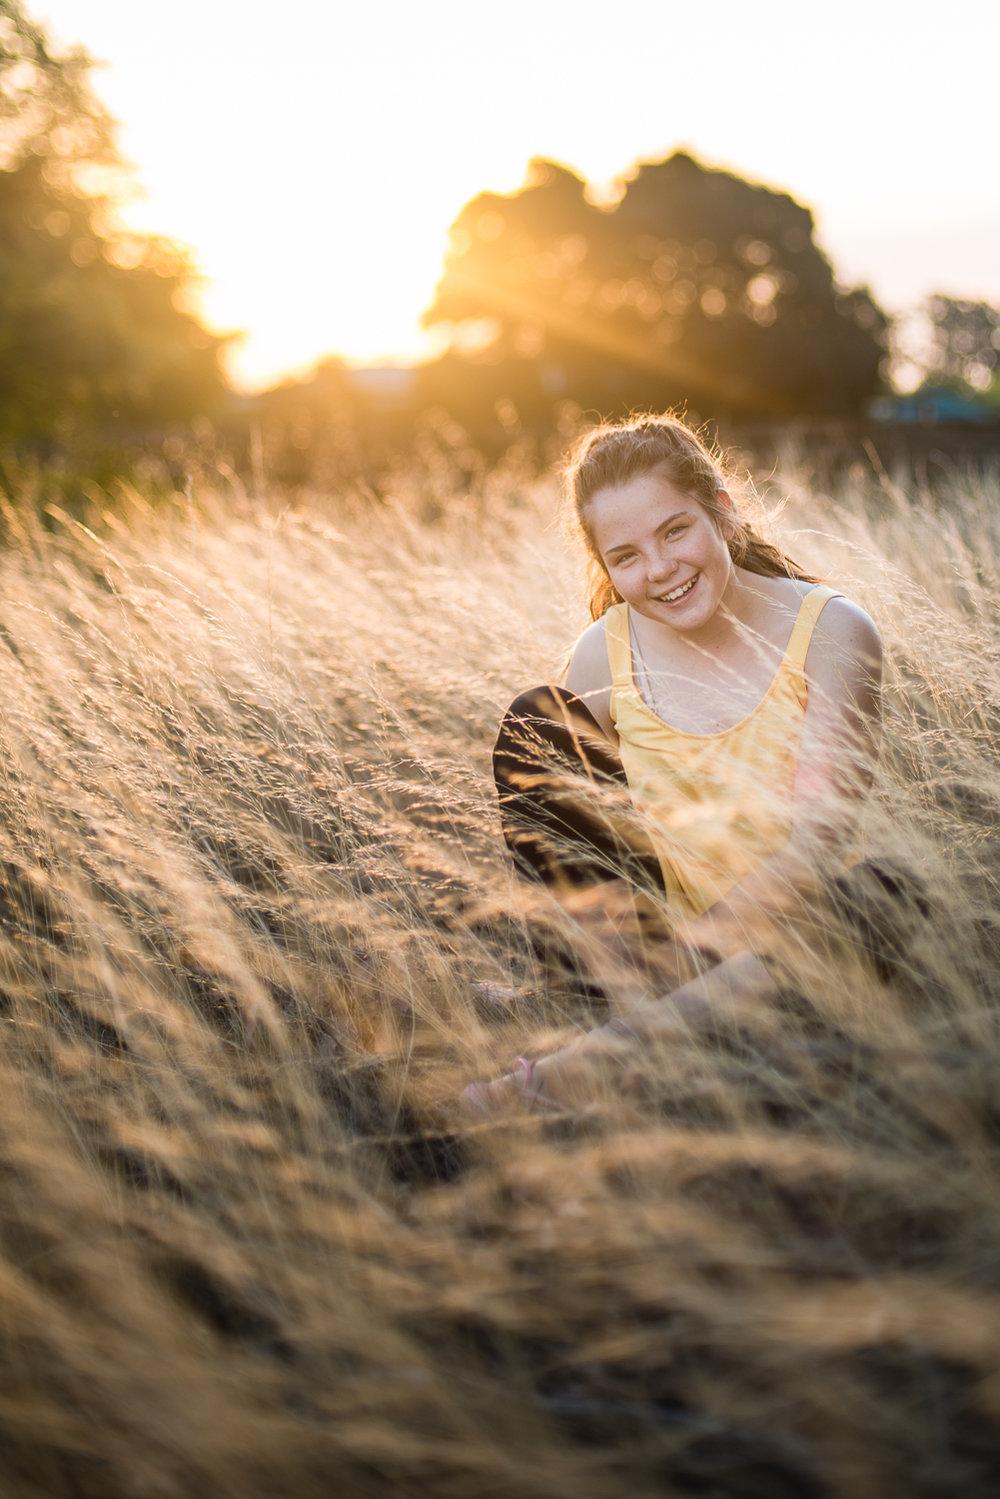 cindycavanagh-sydneyphotographer-longgrass (45 of 47).JPG